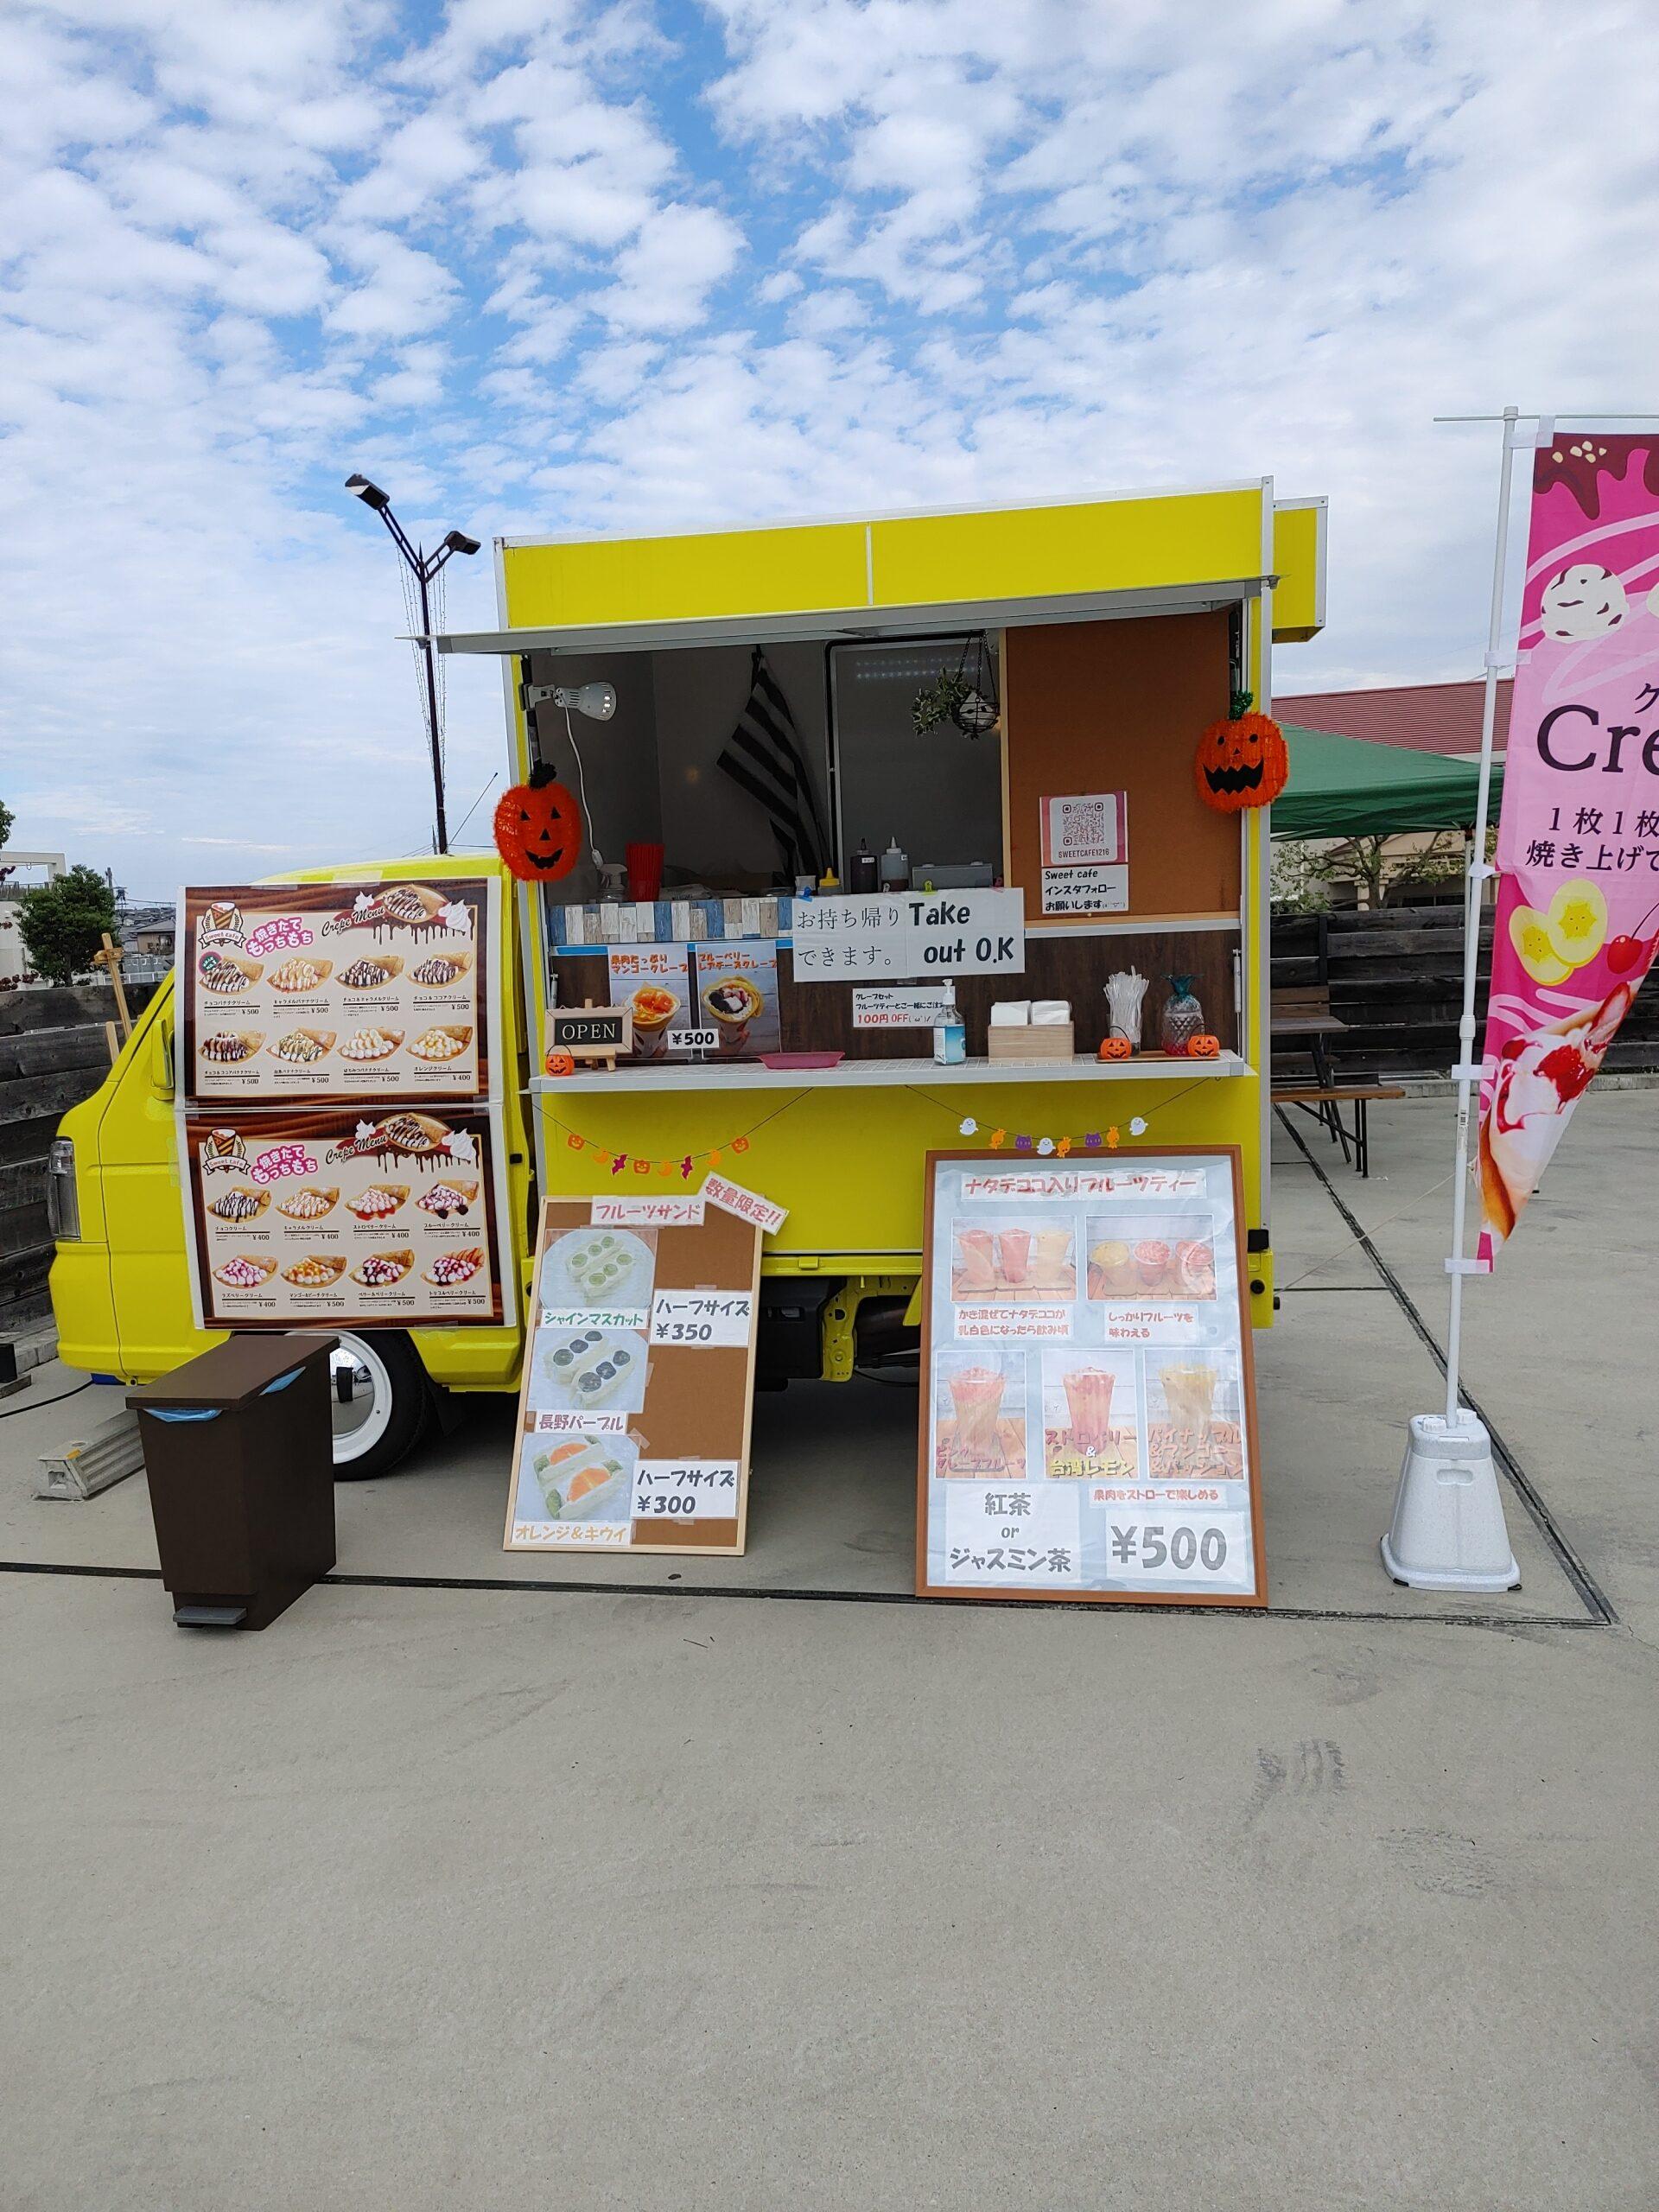 Sweetcafe,スウィートカフェ,キッチンカー,フードトラック,移動販売車,イベント,出店,手配,クレープ,ホットサンド,関西,兵庫